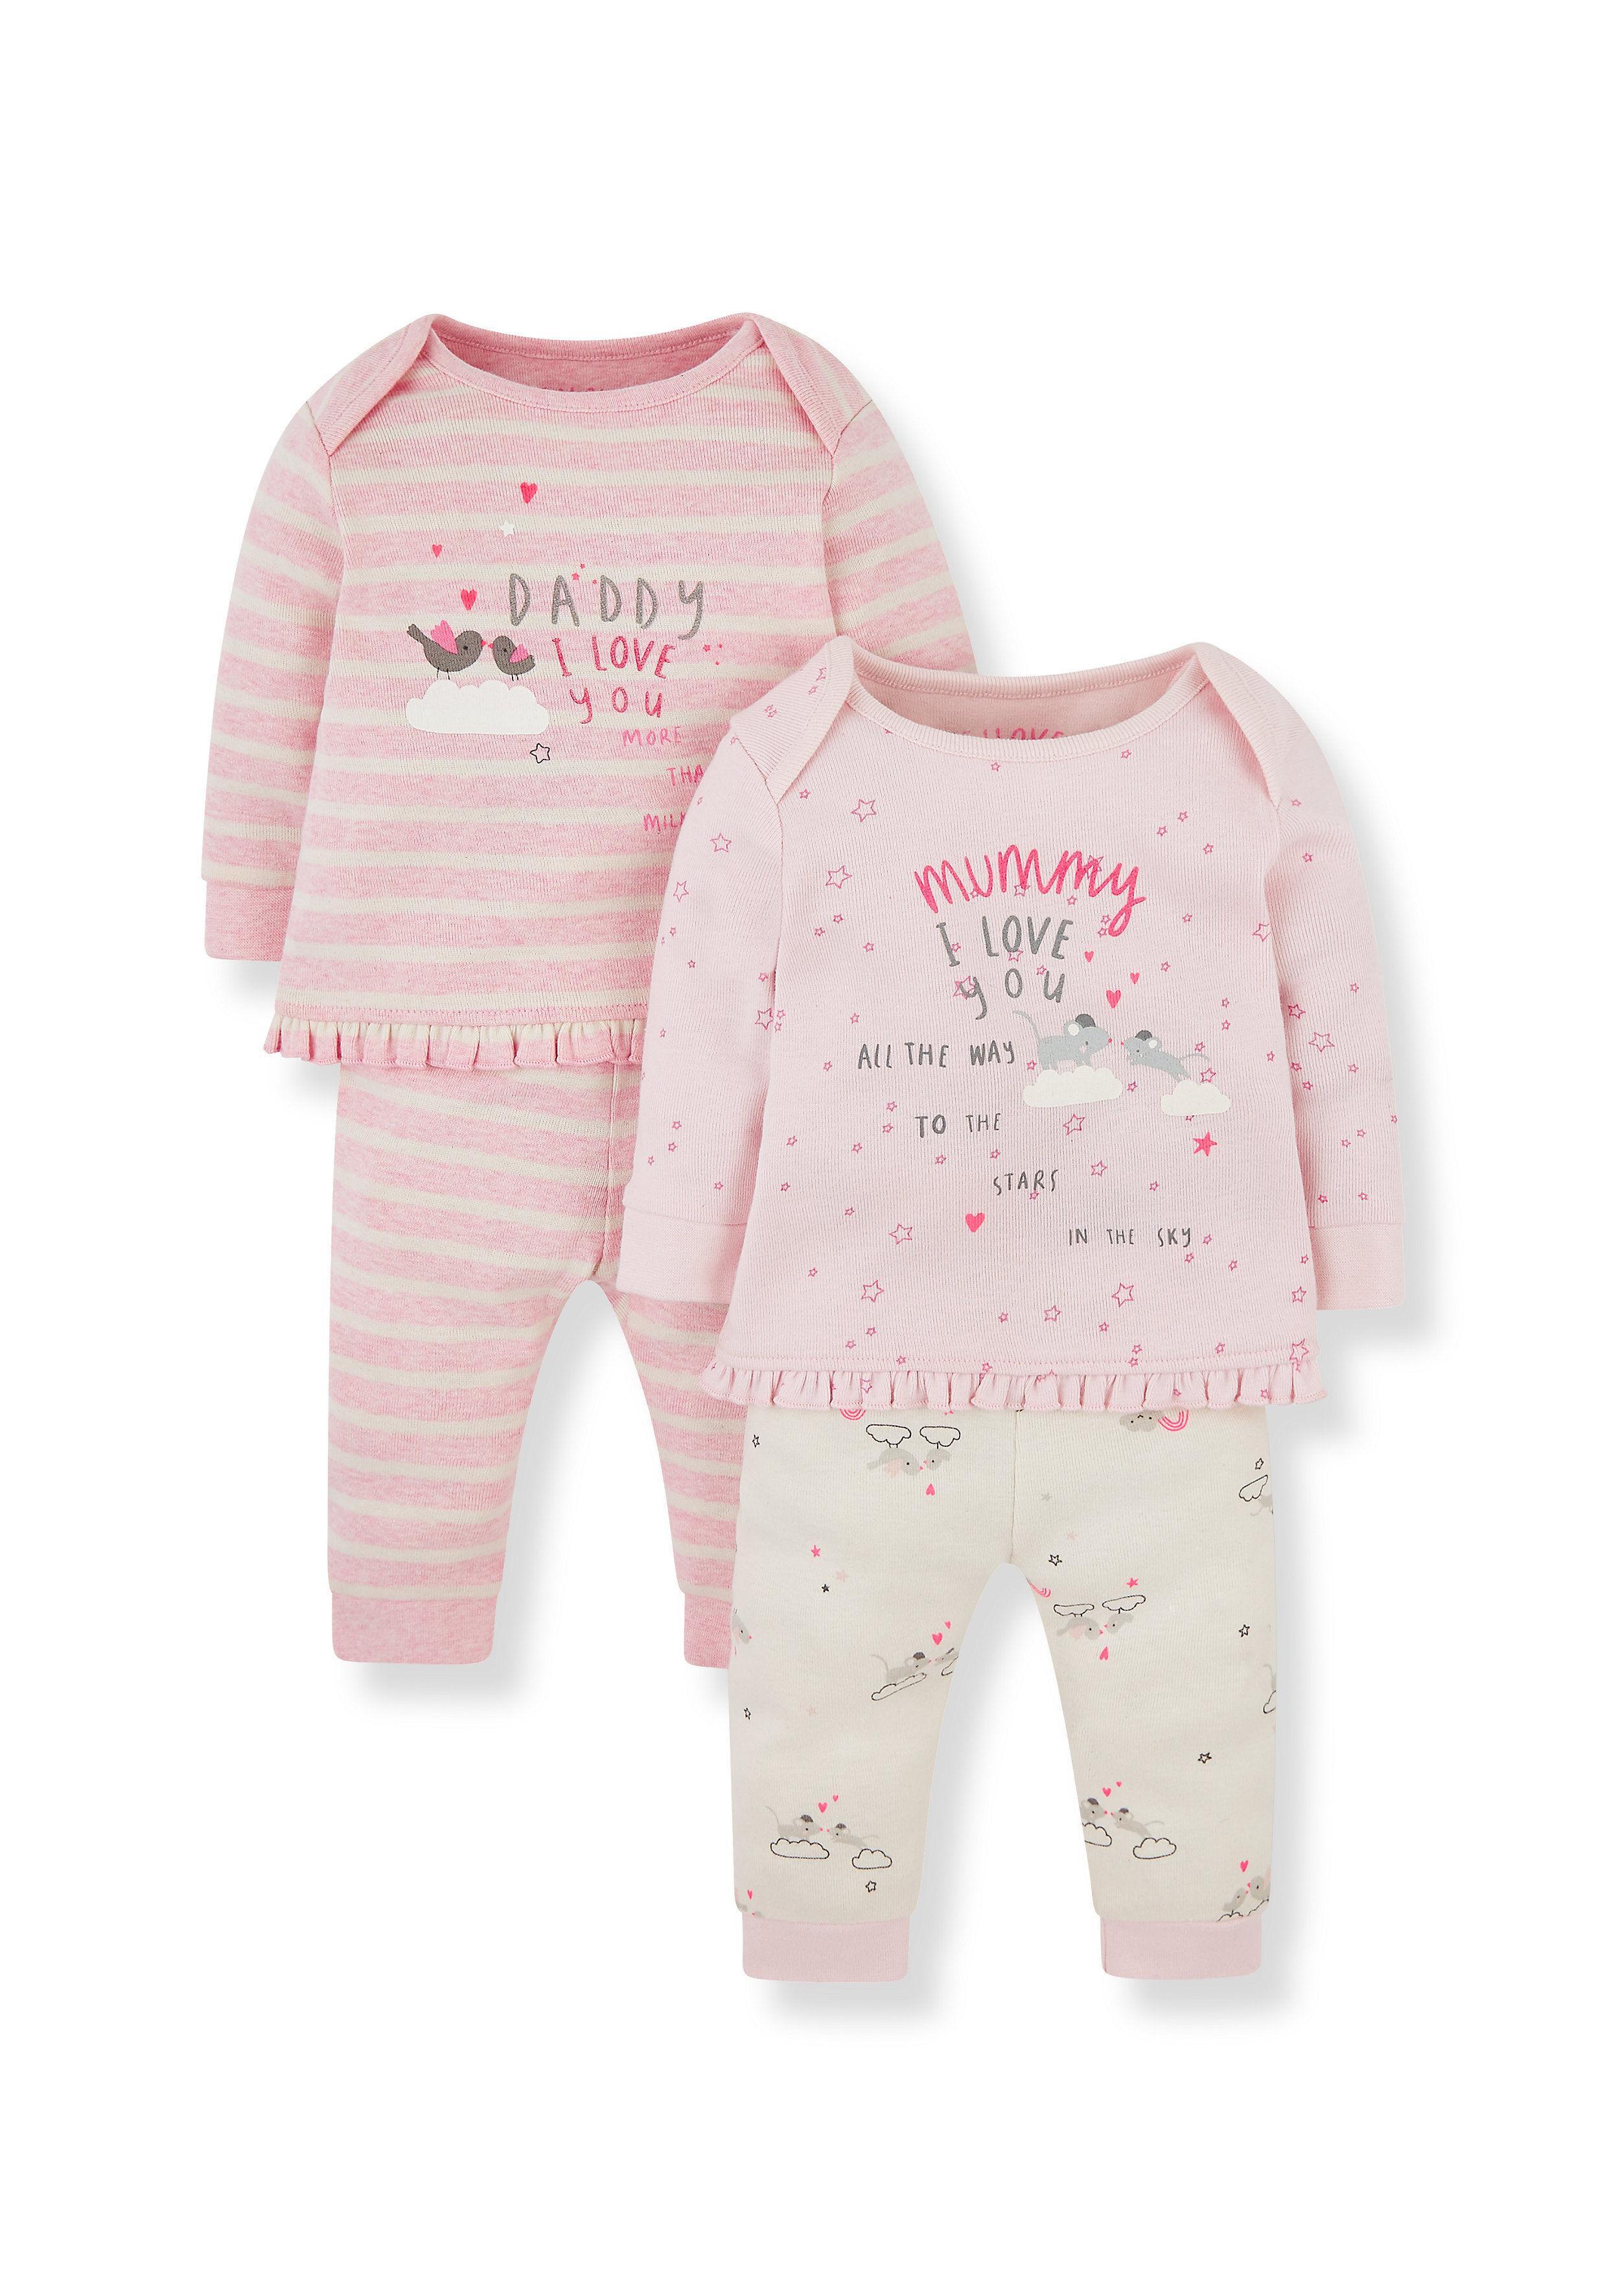 Mothercare | Girls Full Sleeves Pyjama Set Text Print - Pack Of 2 - Pink